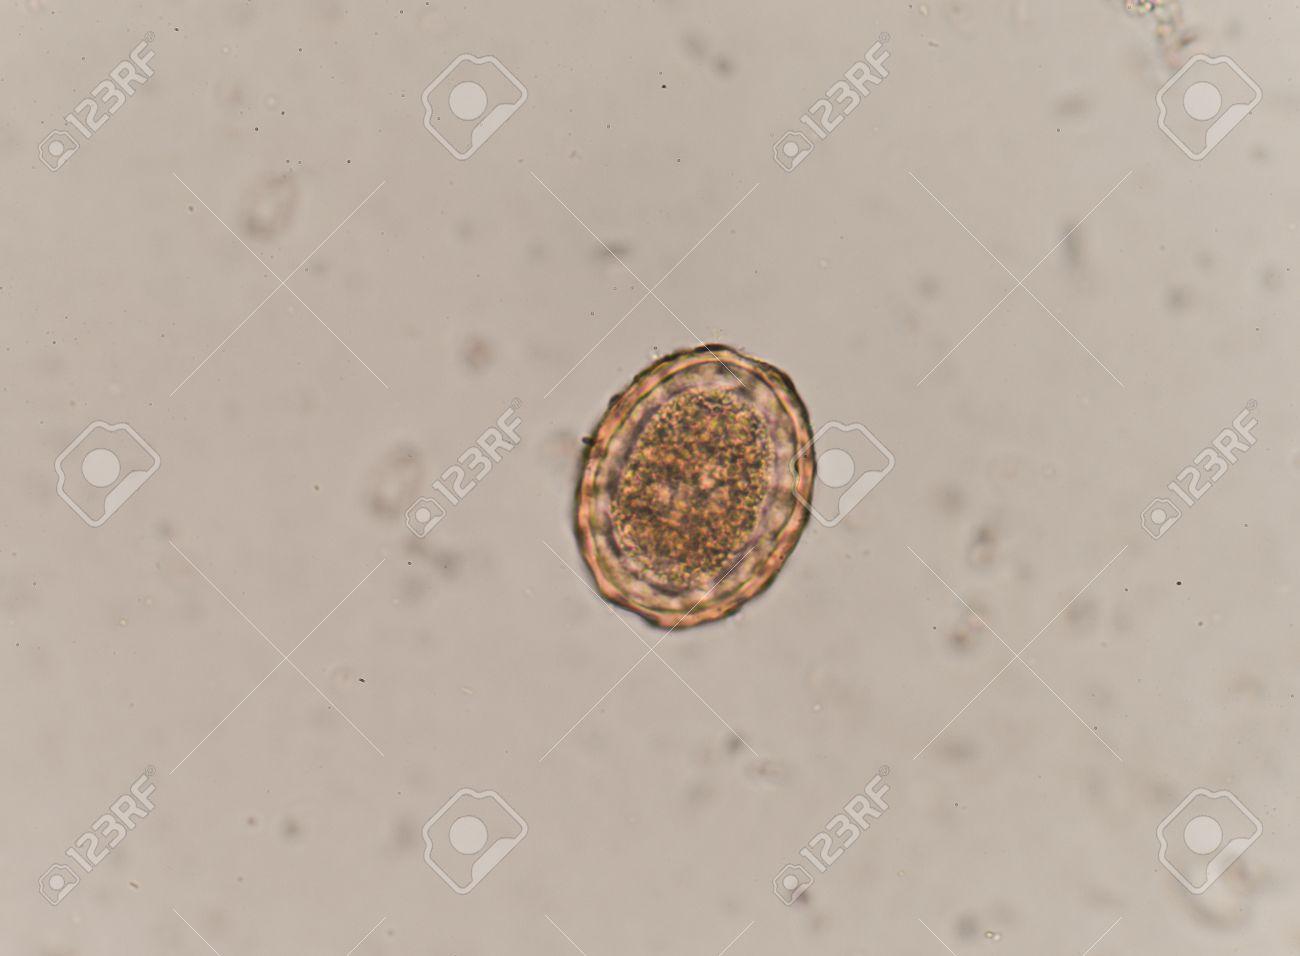 lumbricoides in human intestine